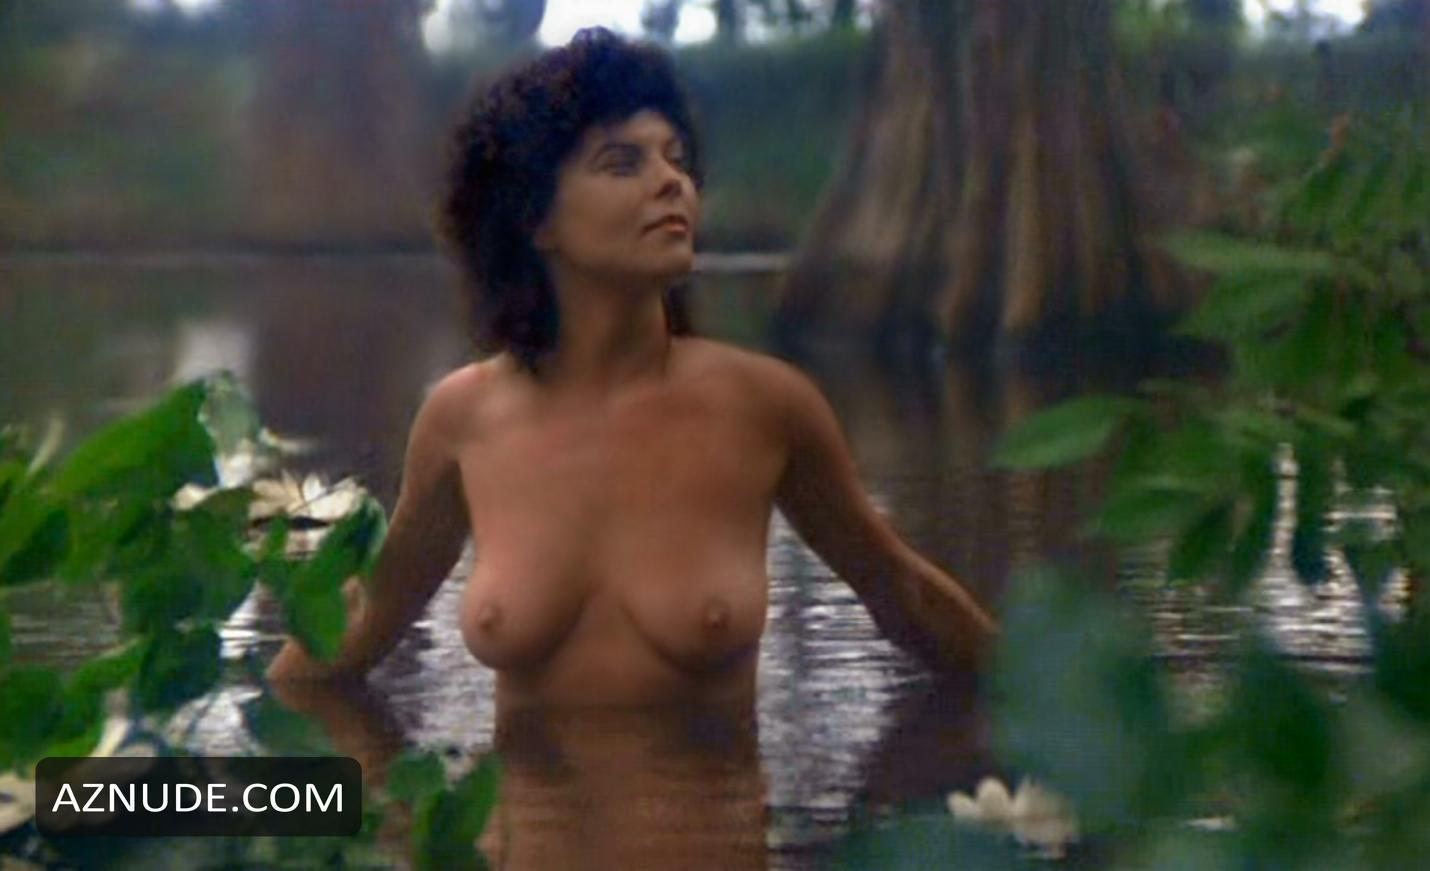 Adrienne barbeau nudity photos